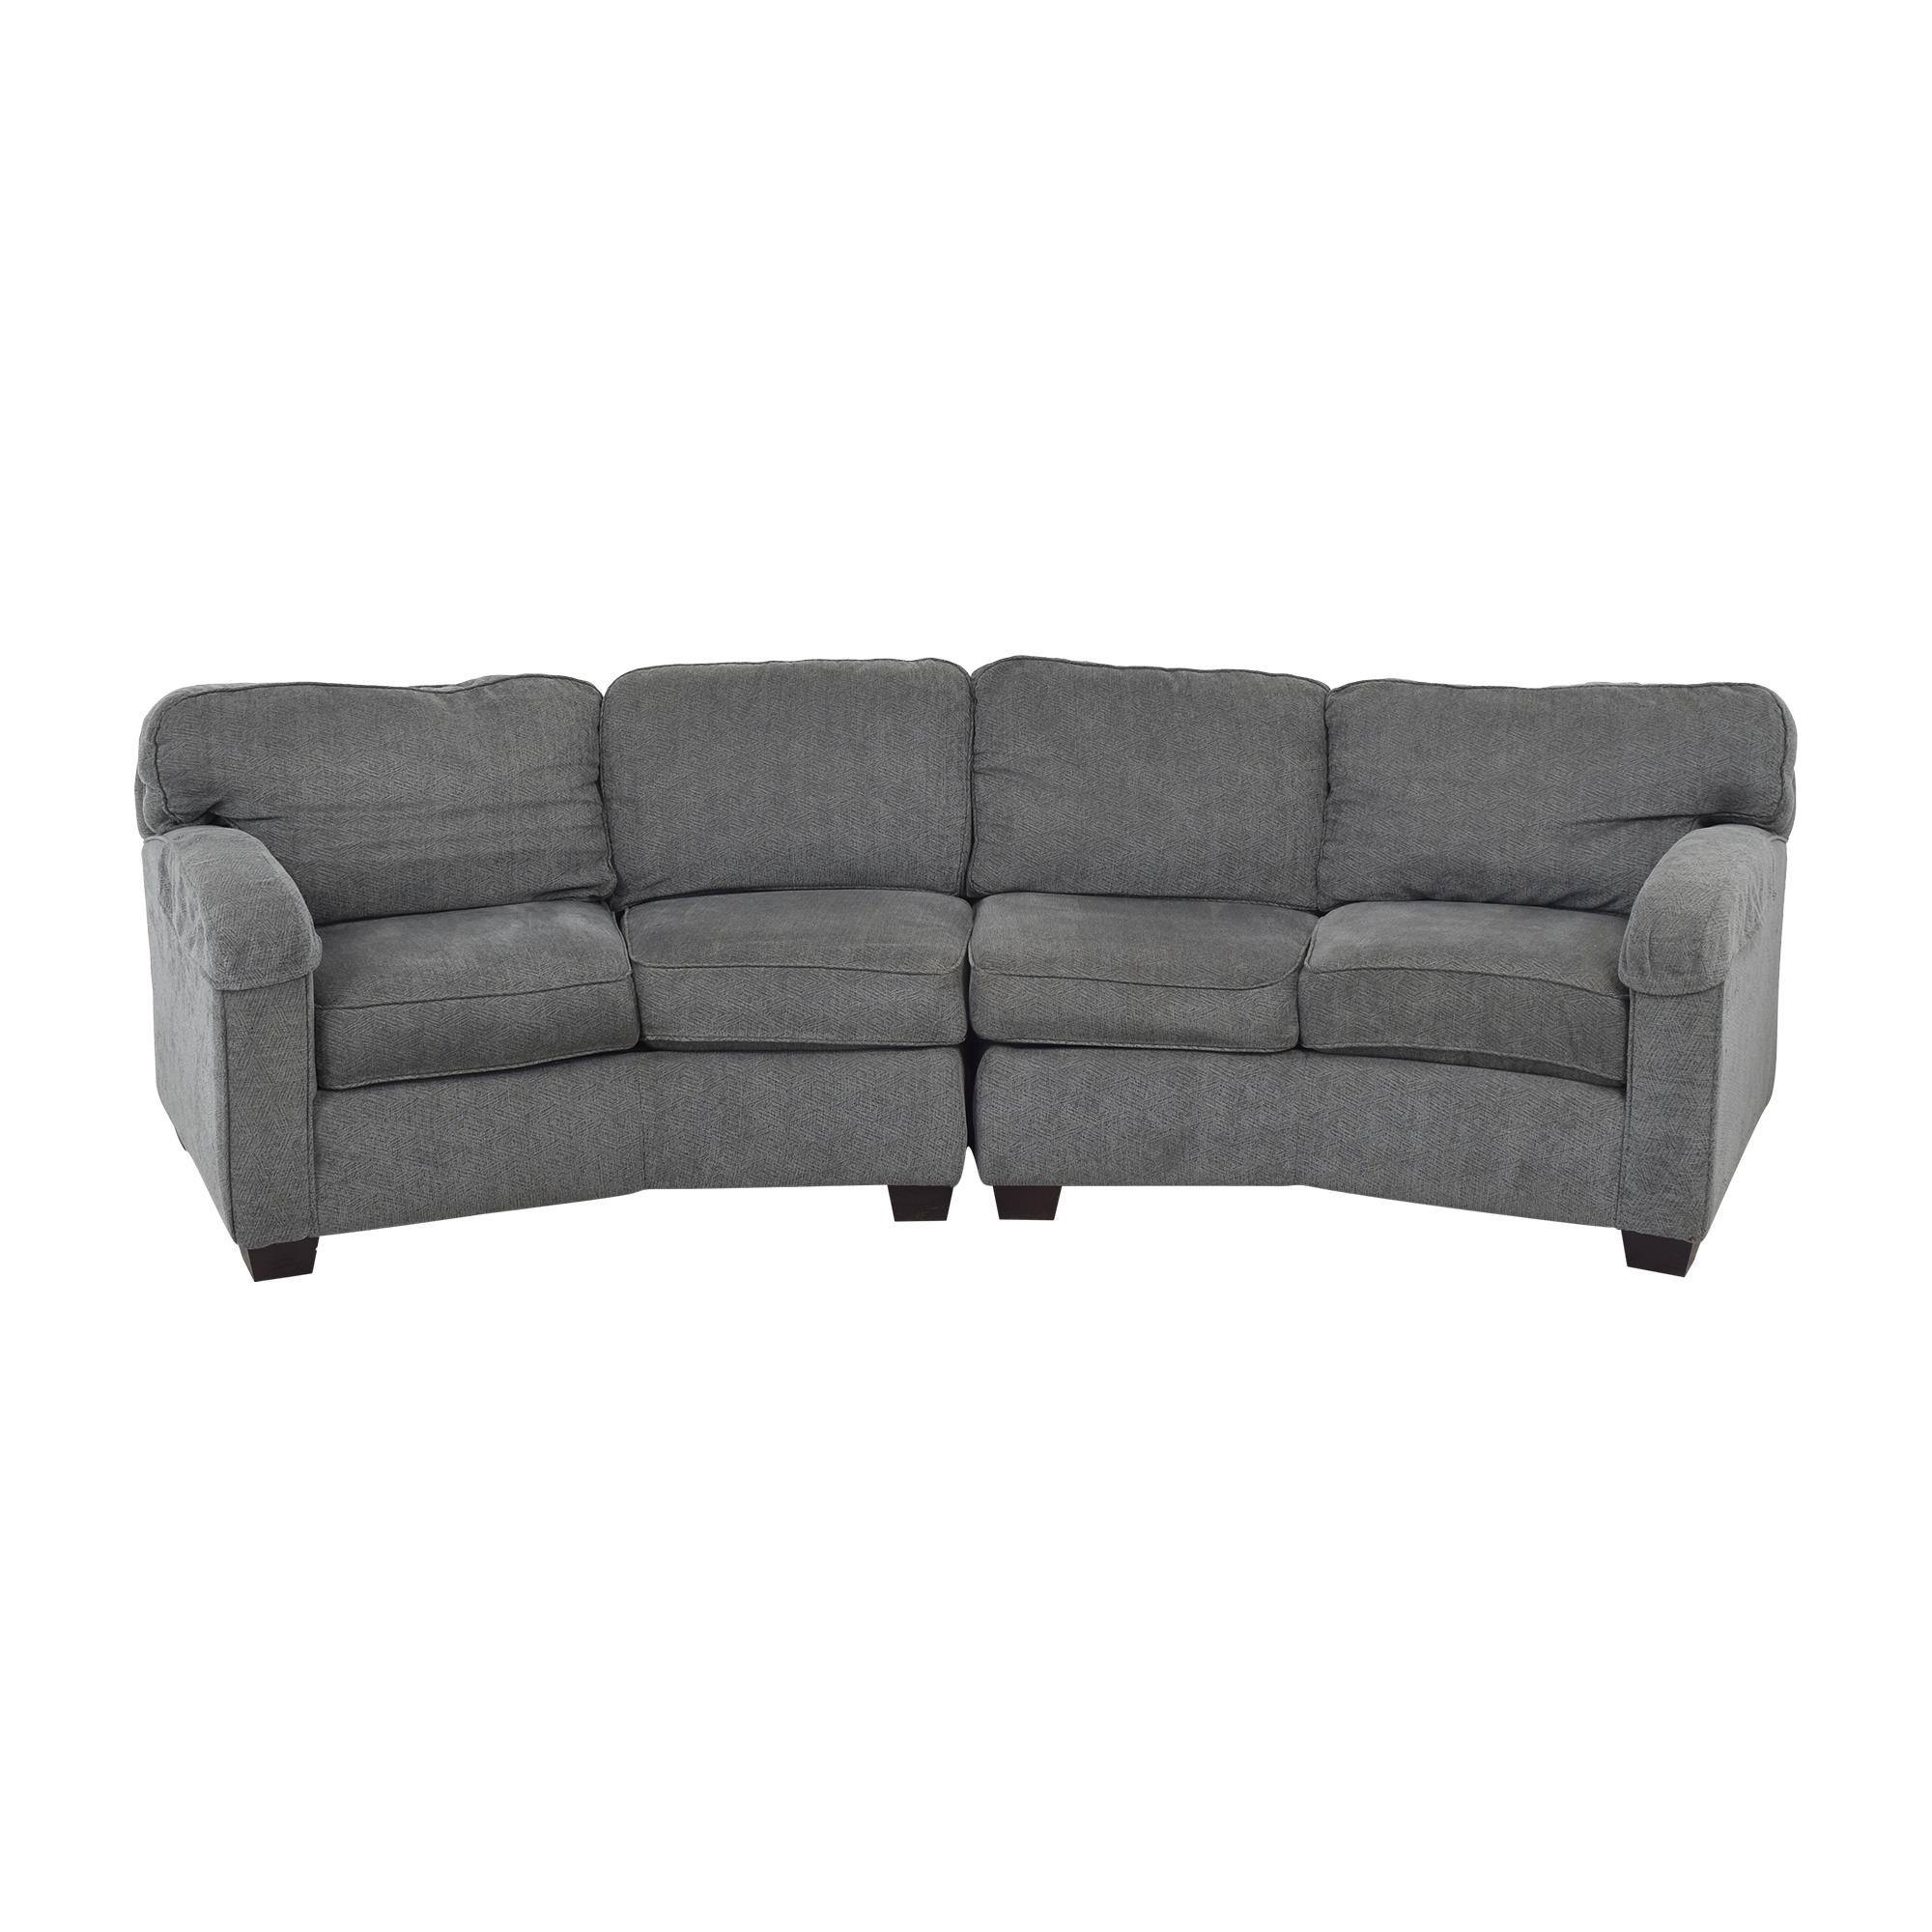 Bassett Furniture Bassett Furniture Sectional Sofa with Ottomans Sofas